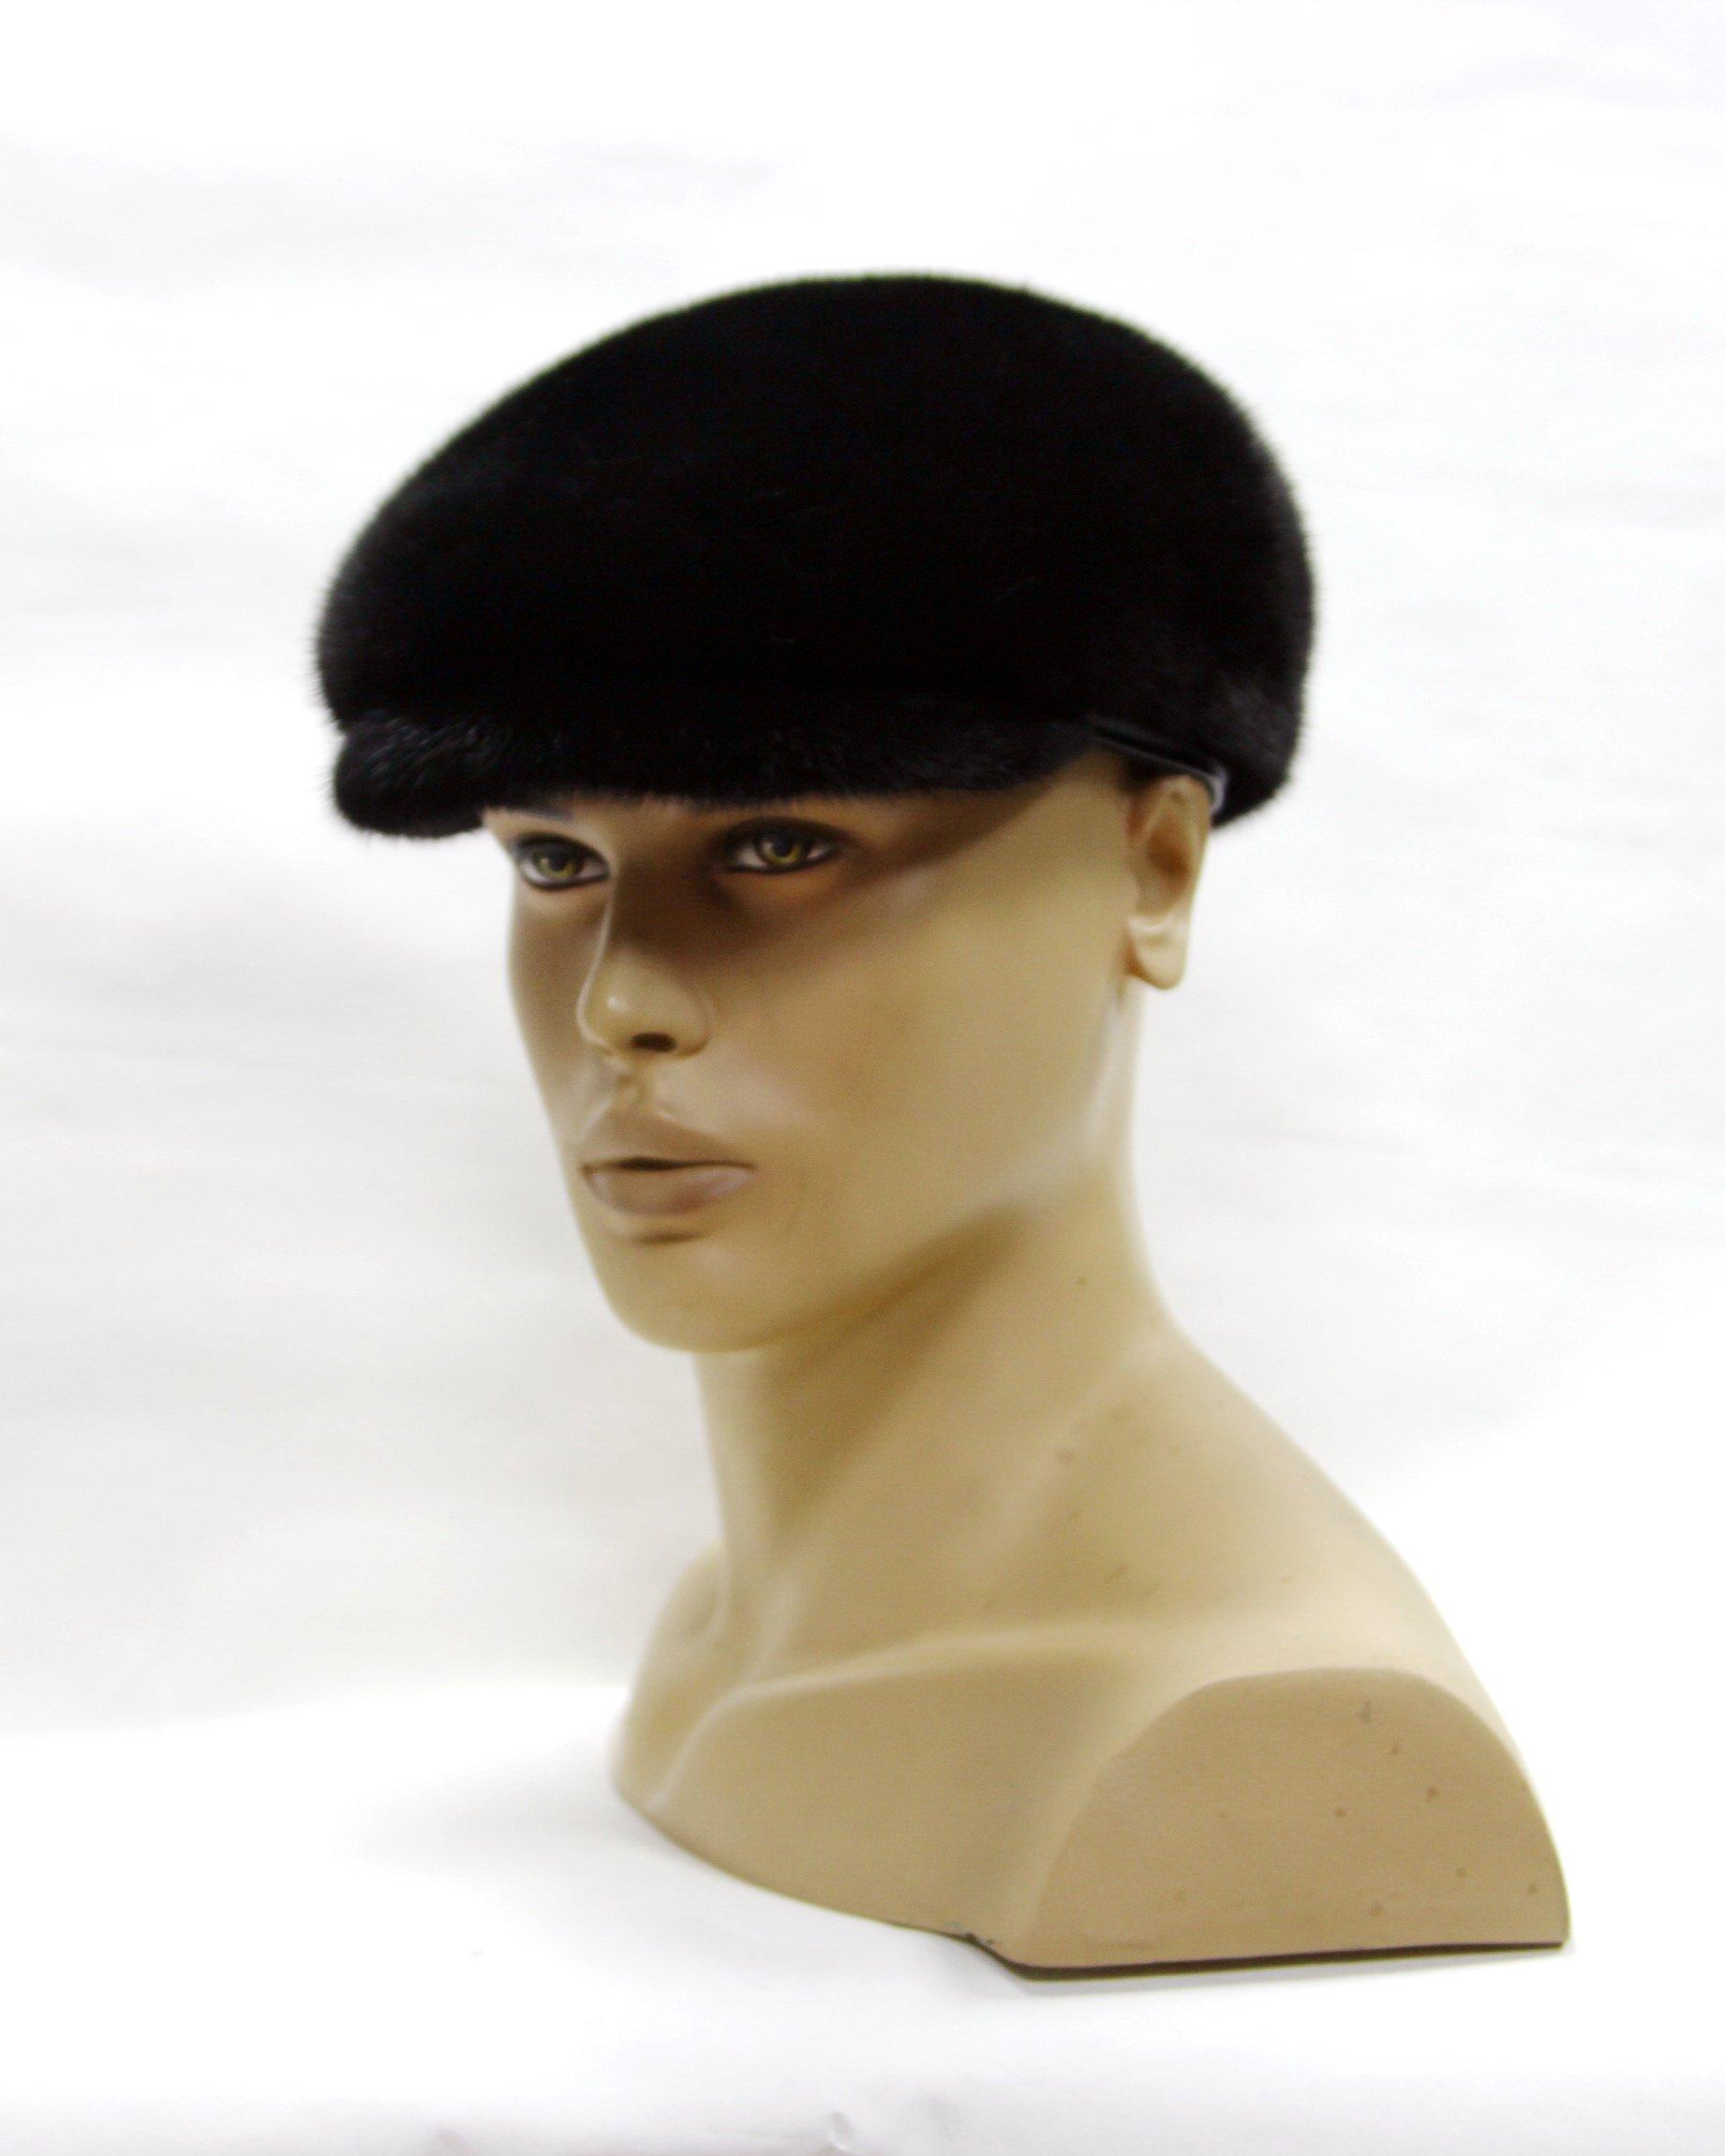 Stylish Men's Flat Cap Made Of Natural Mink Fur